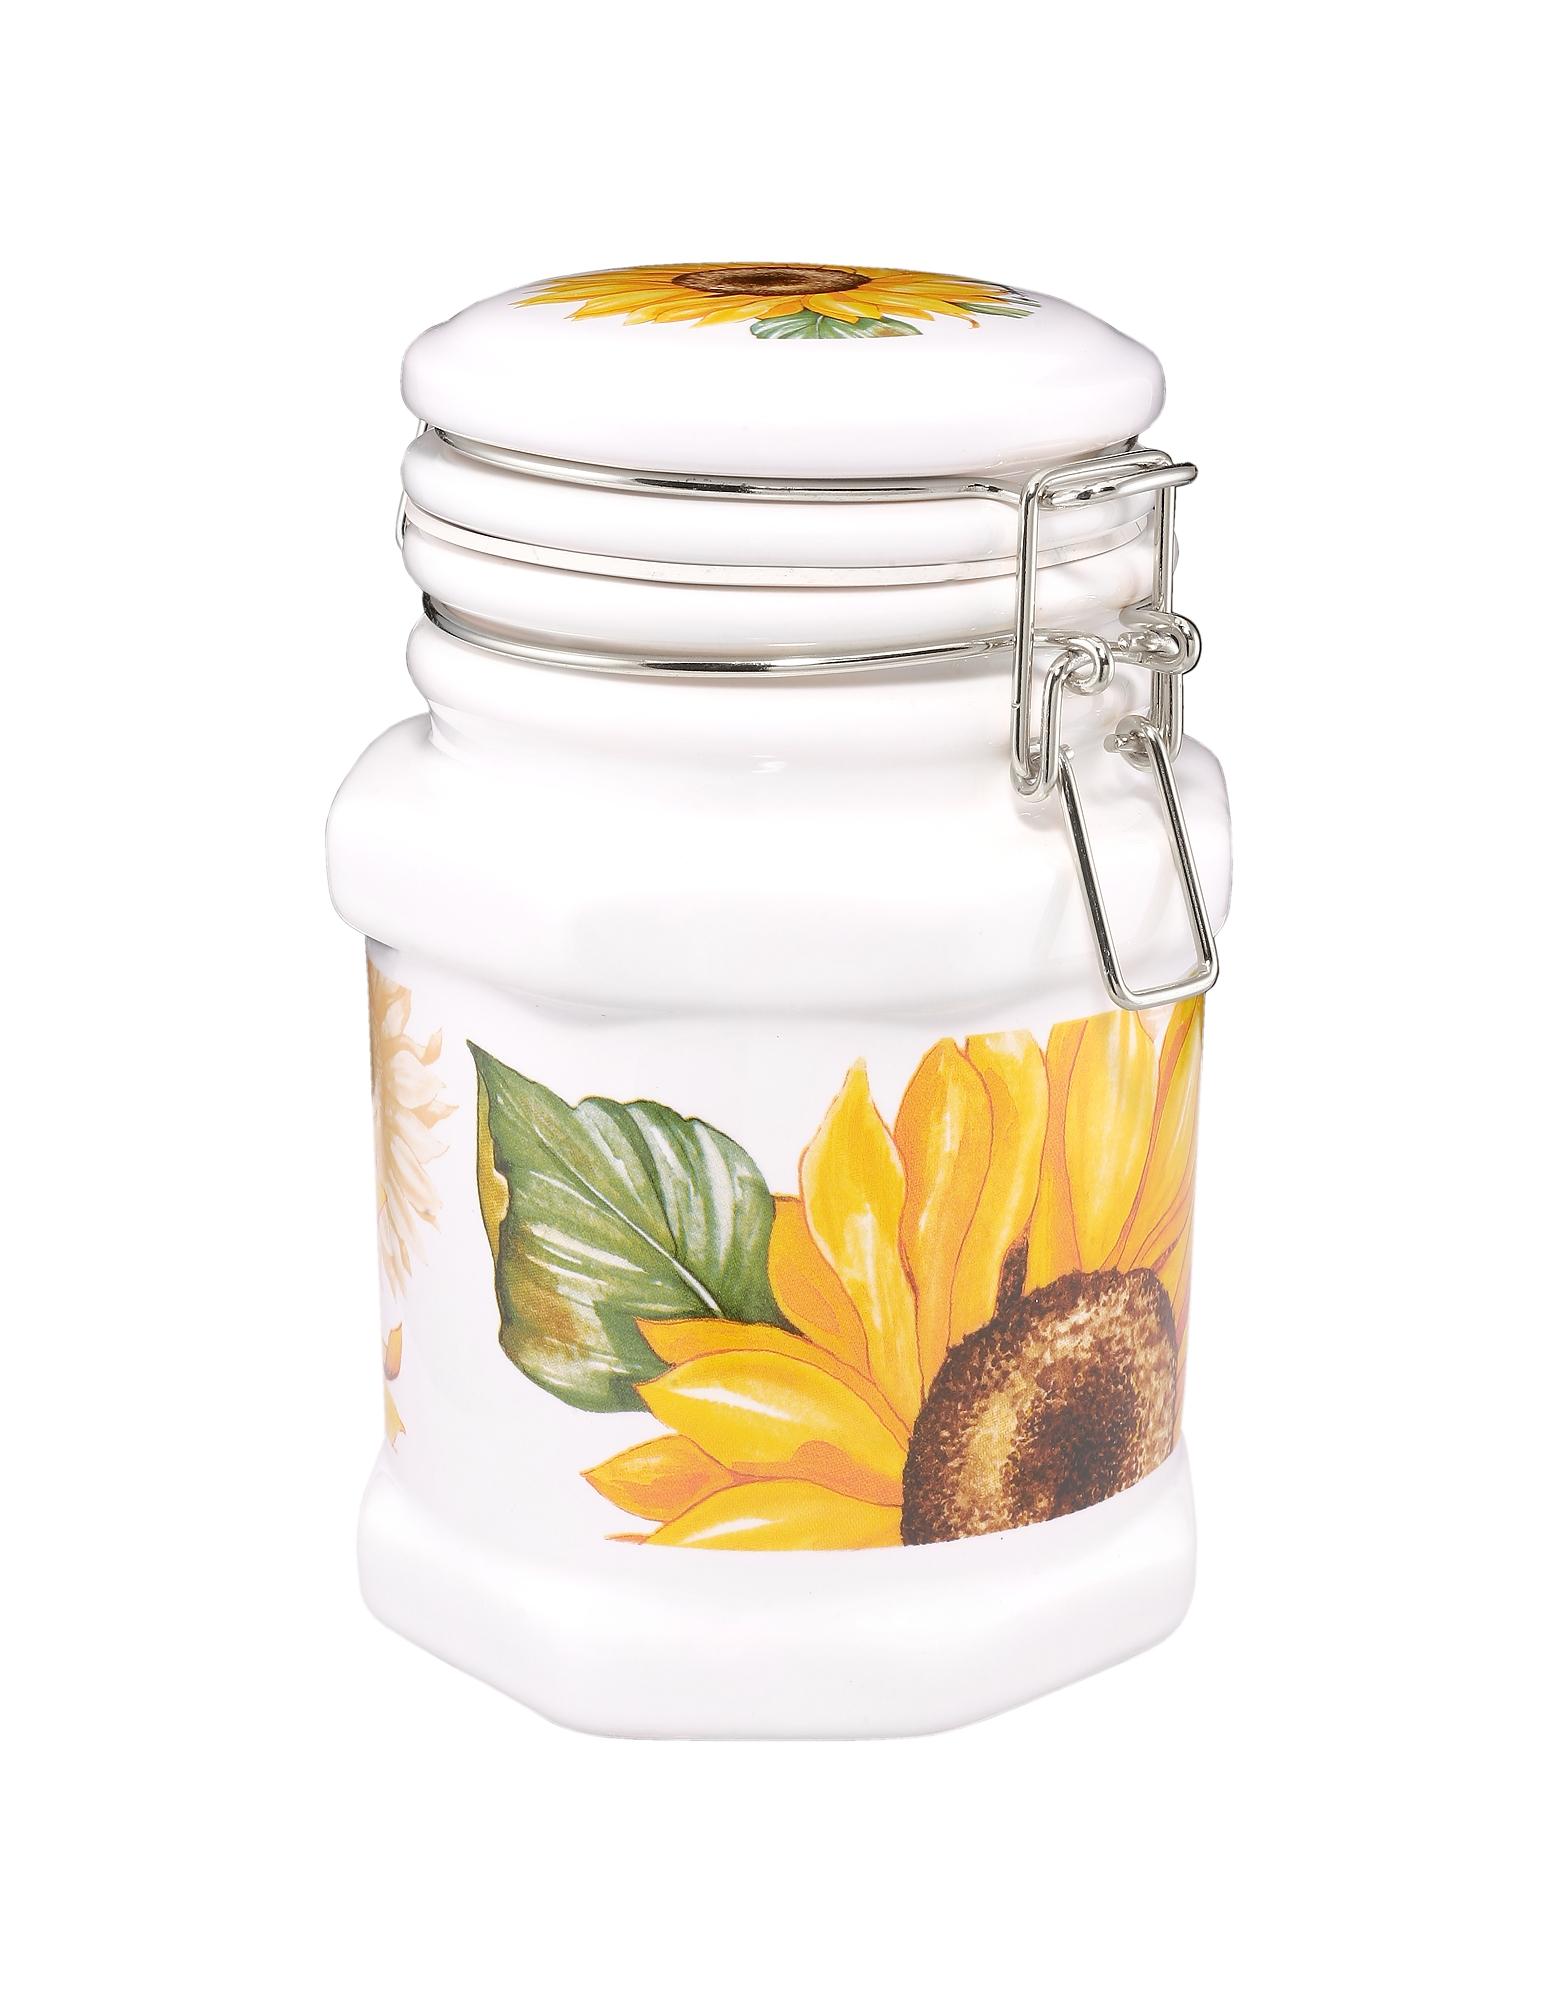 Spigarelli Designer Kitchen & Dining, Sunflower Airtight Seal Ceramic Canister